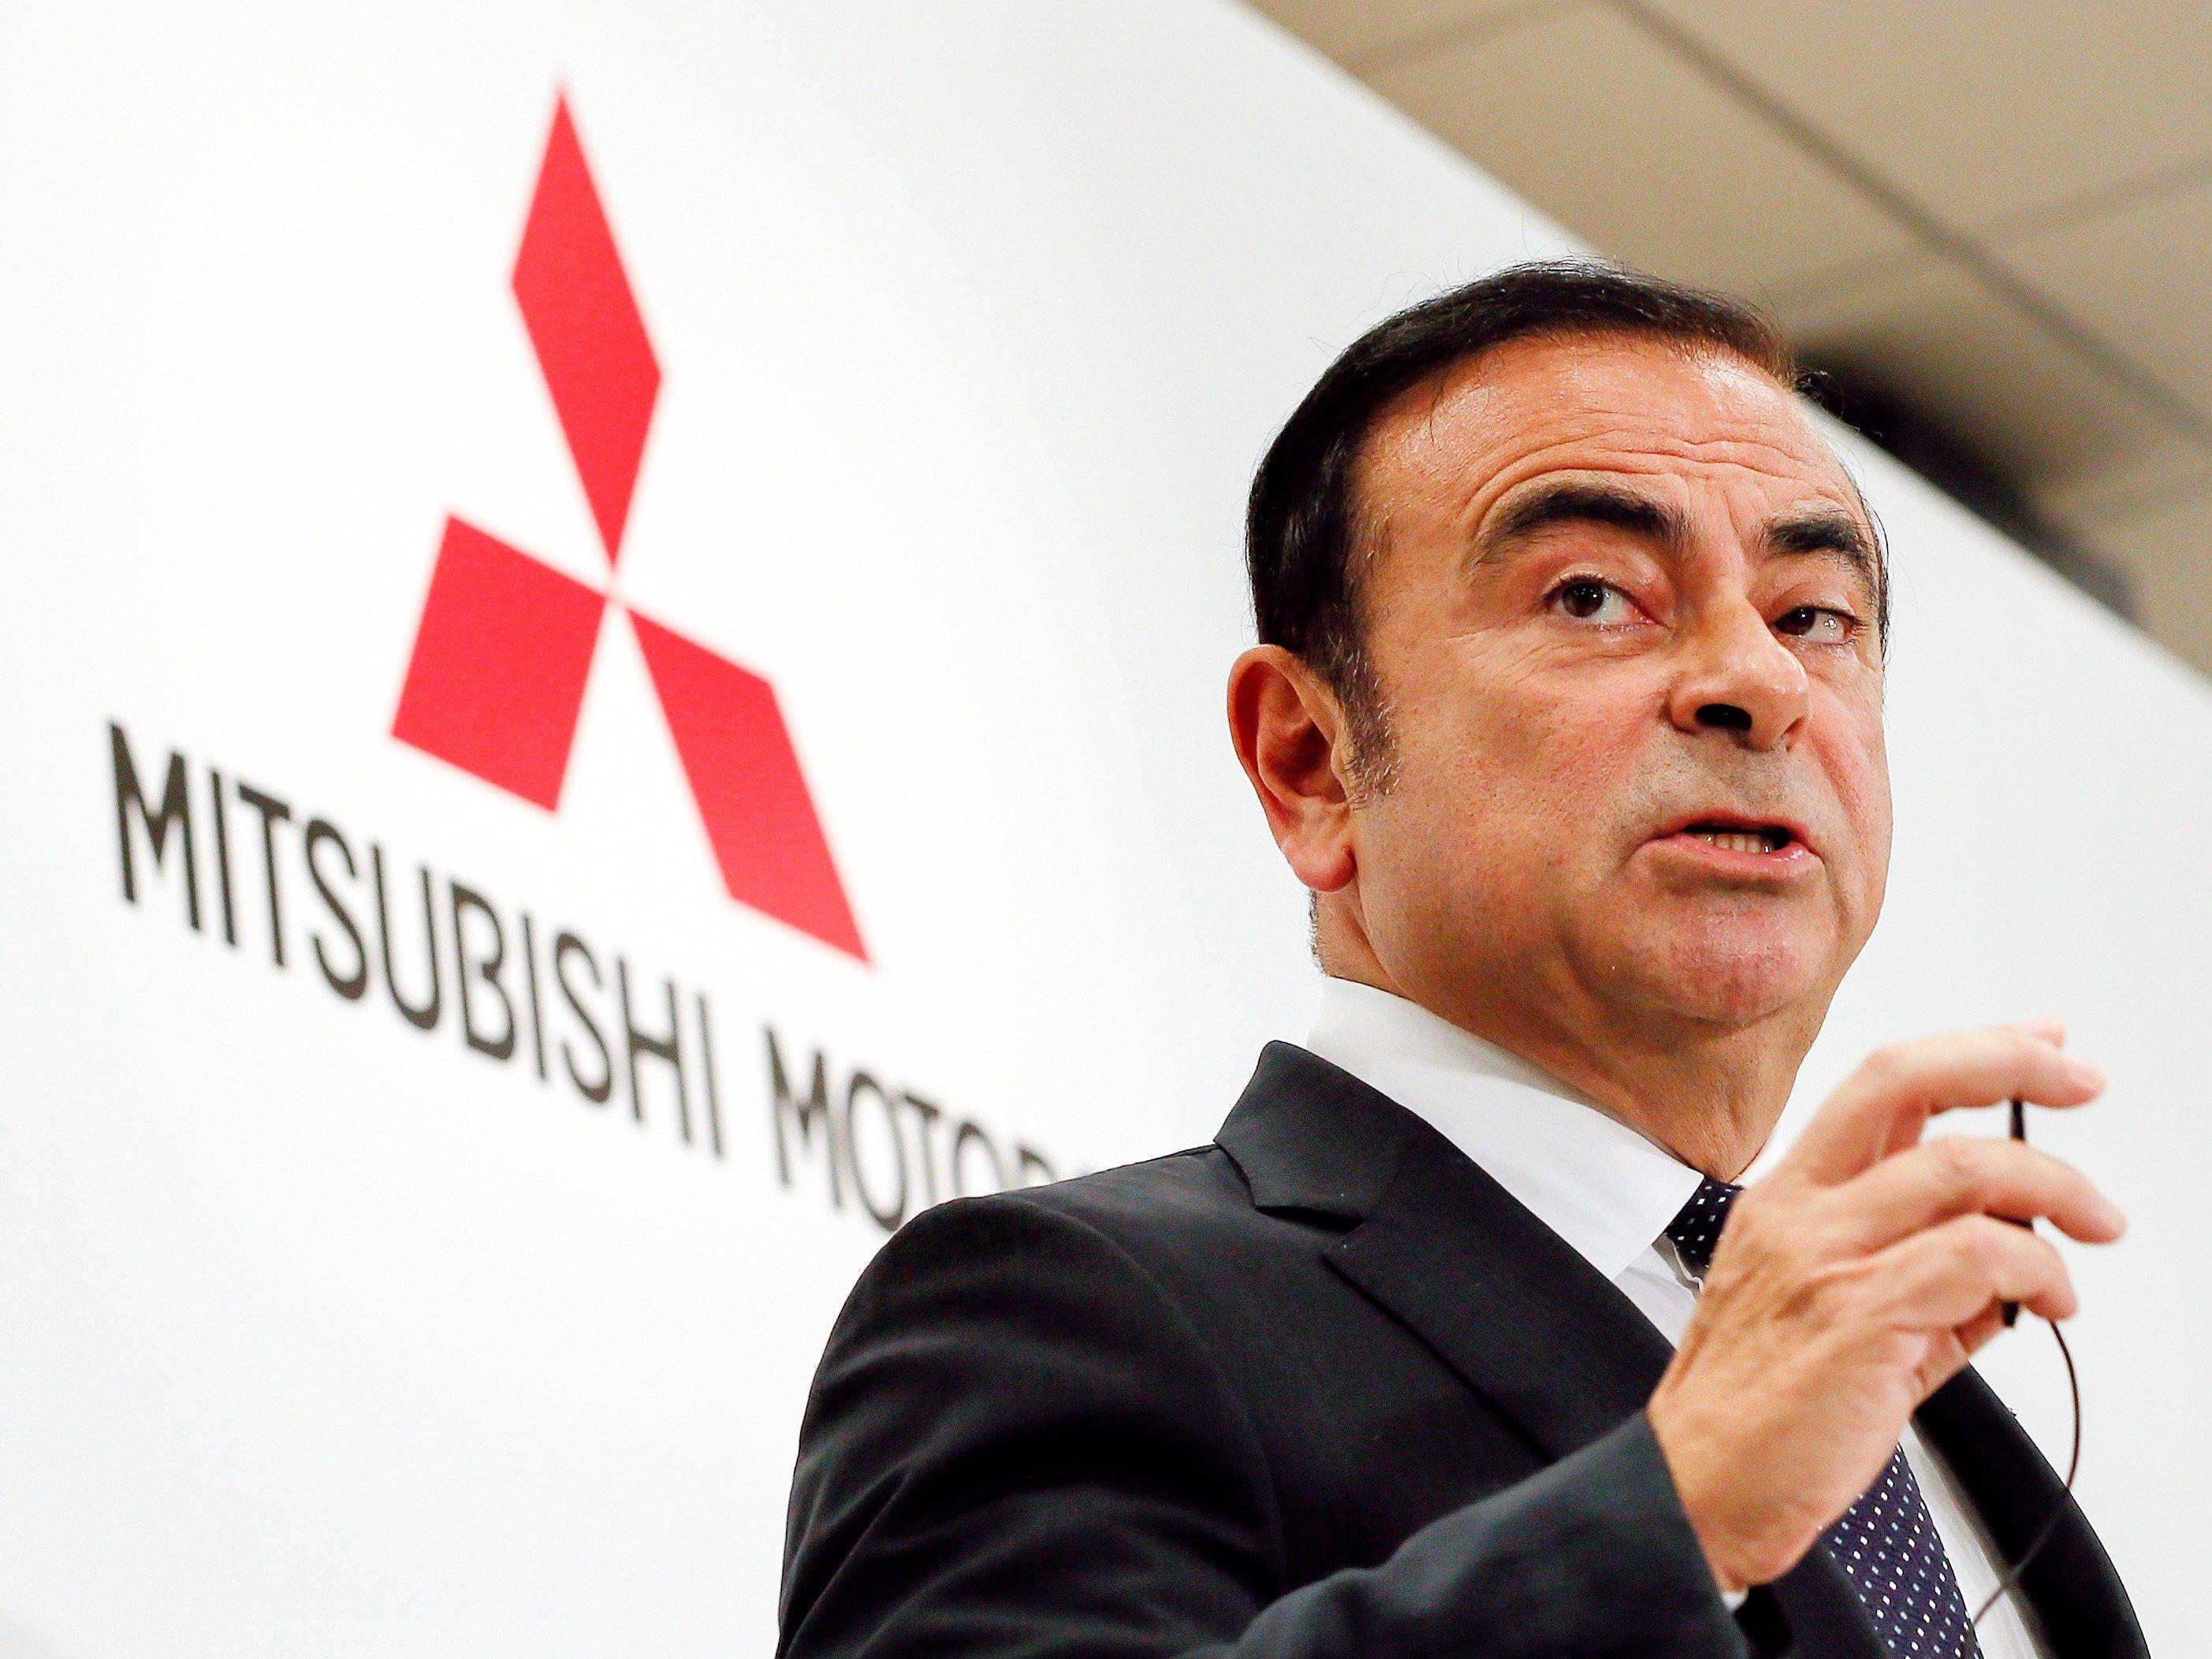 Mitsubishi também demite Carlos Ghosn da presidência